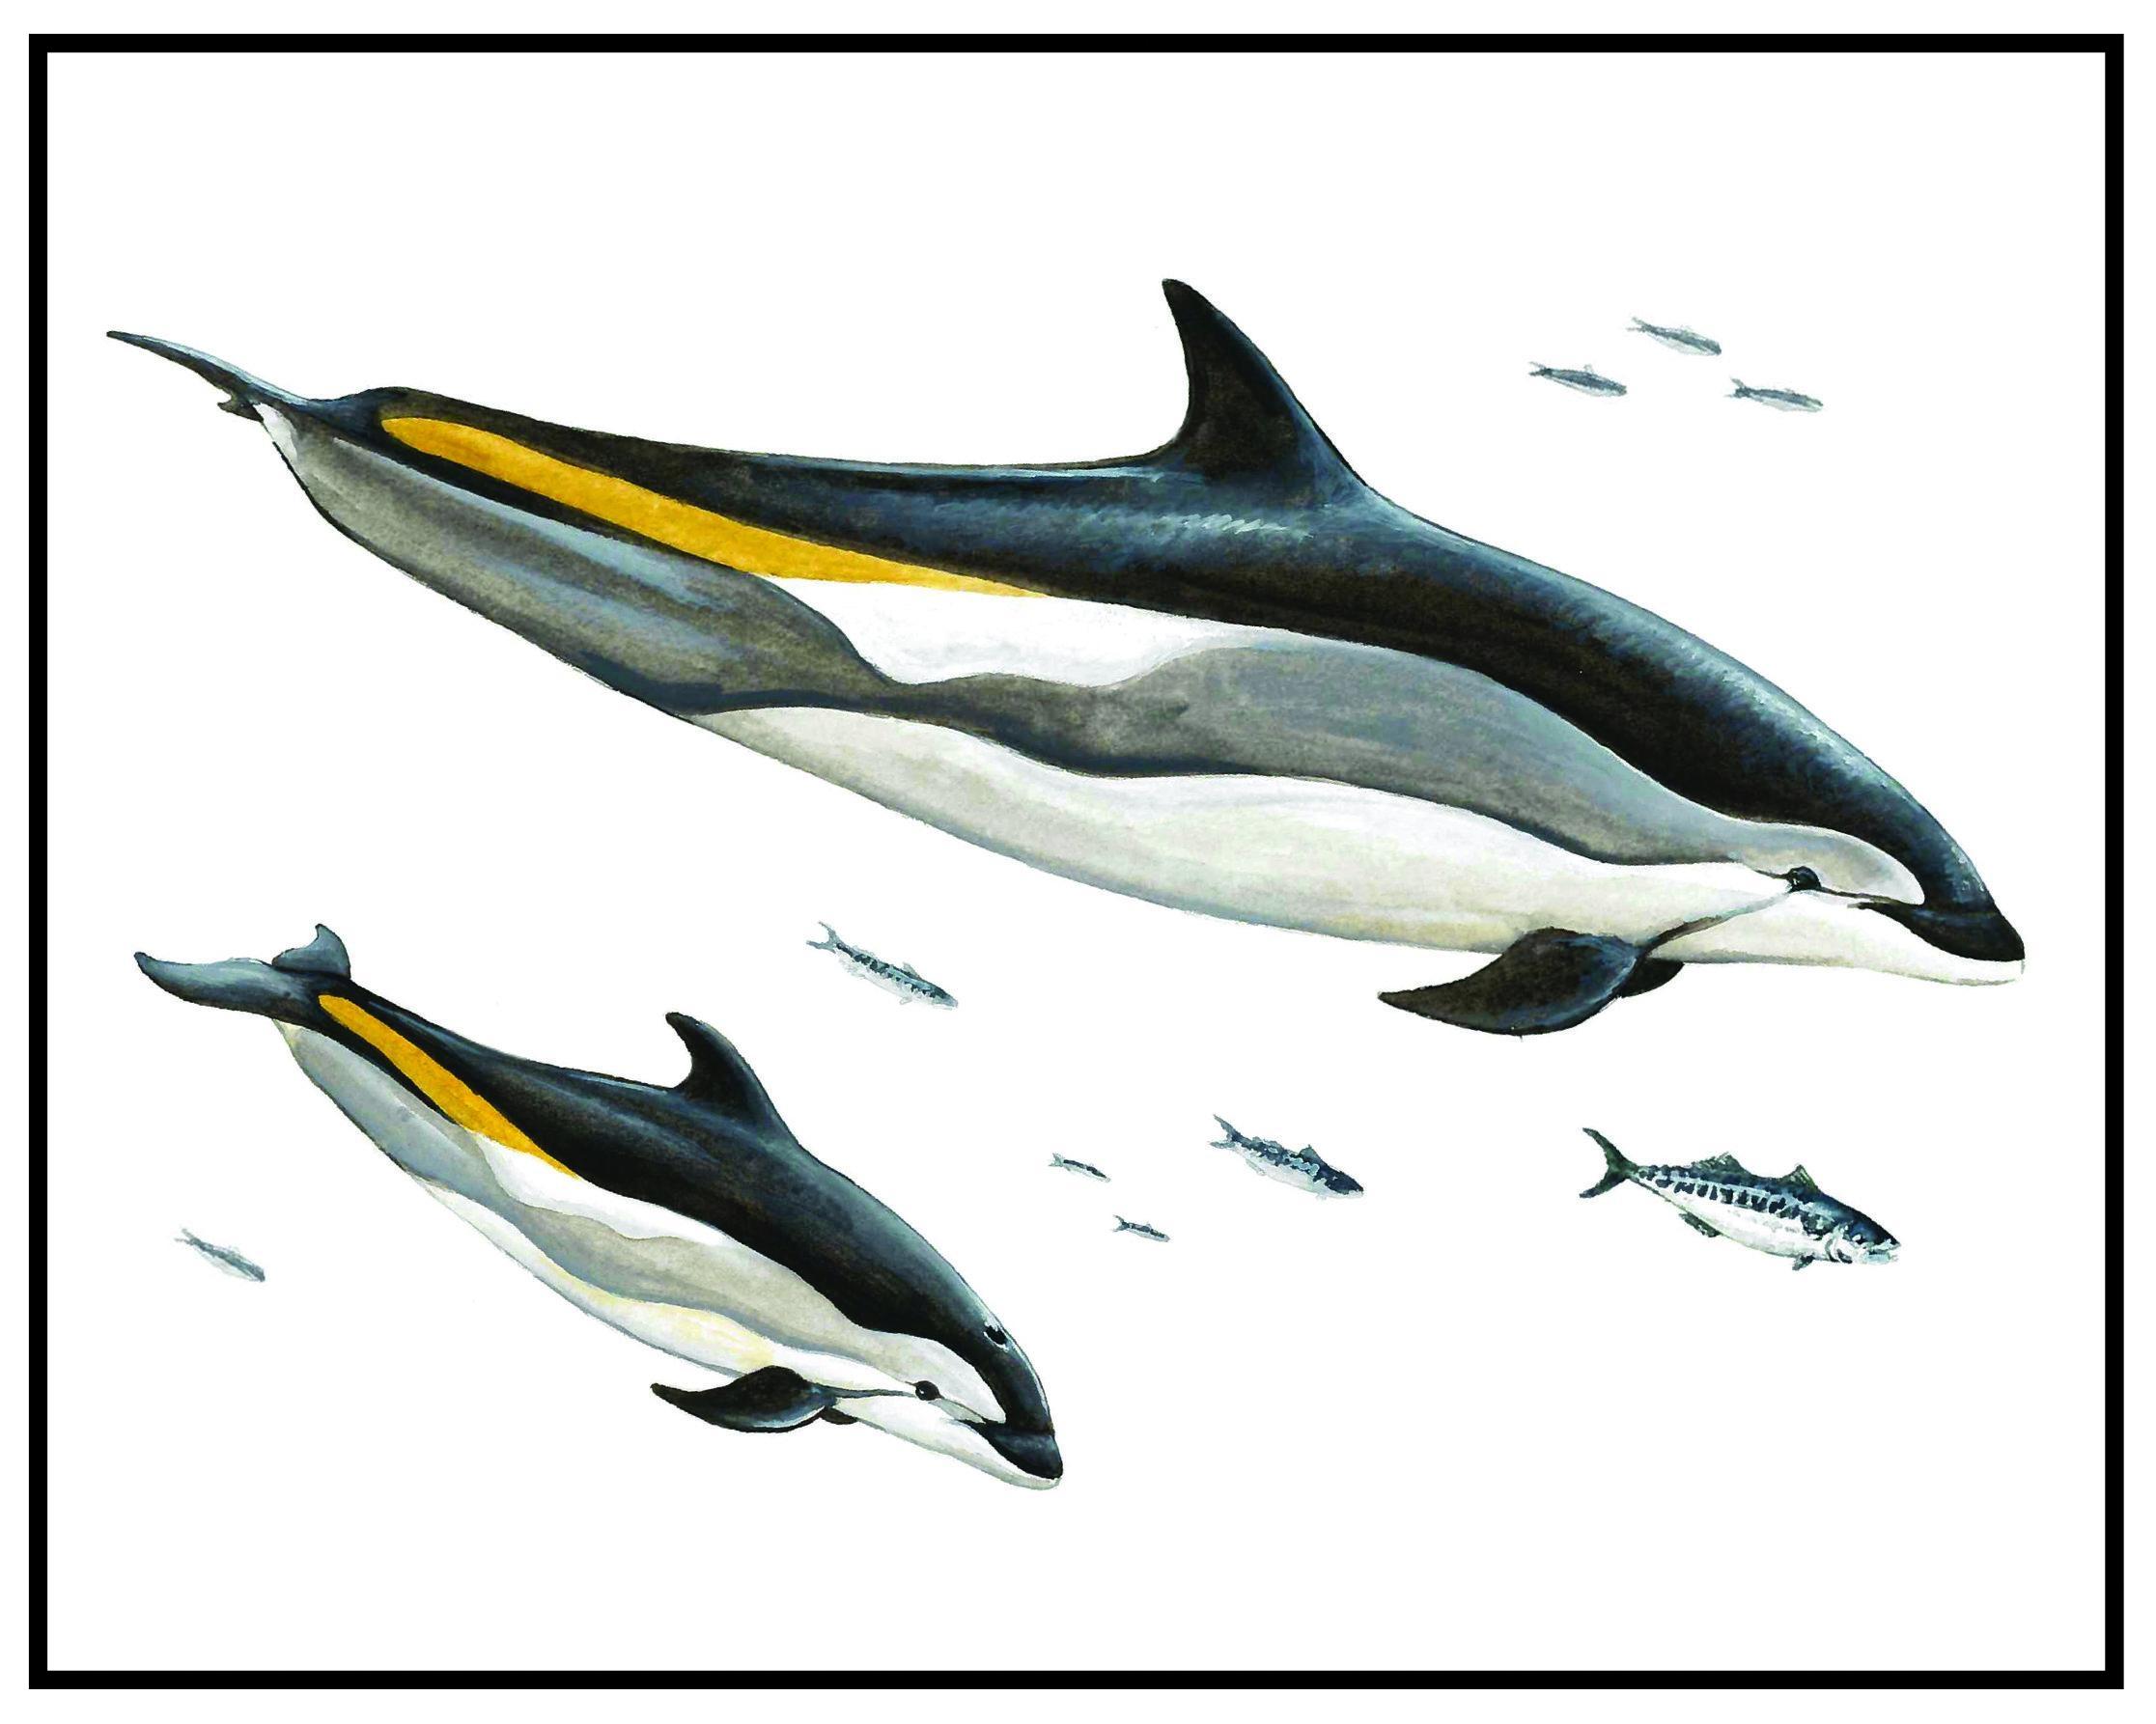 Gulf of Maine Prints_Dolphin5x7-01.jpg